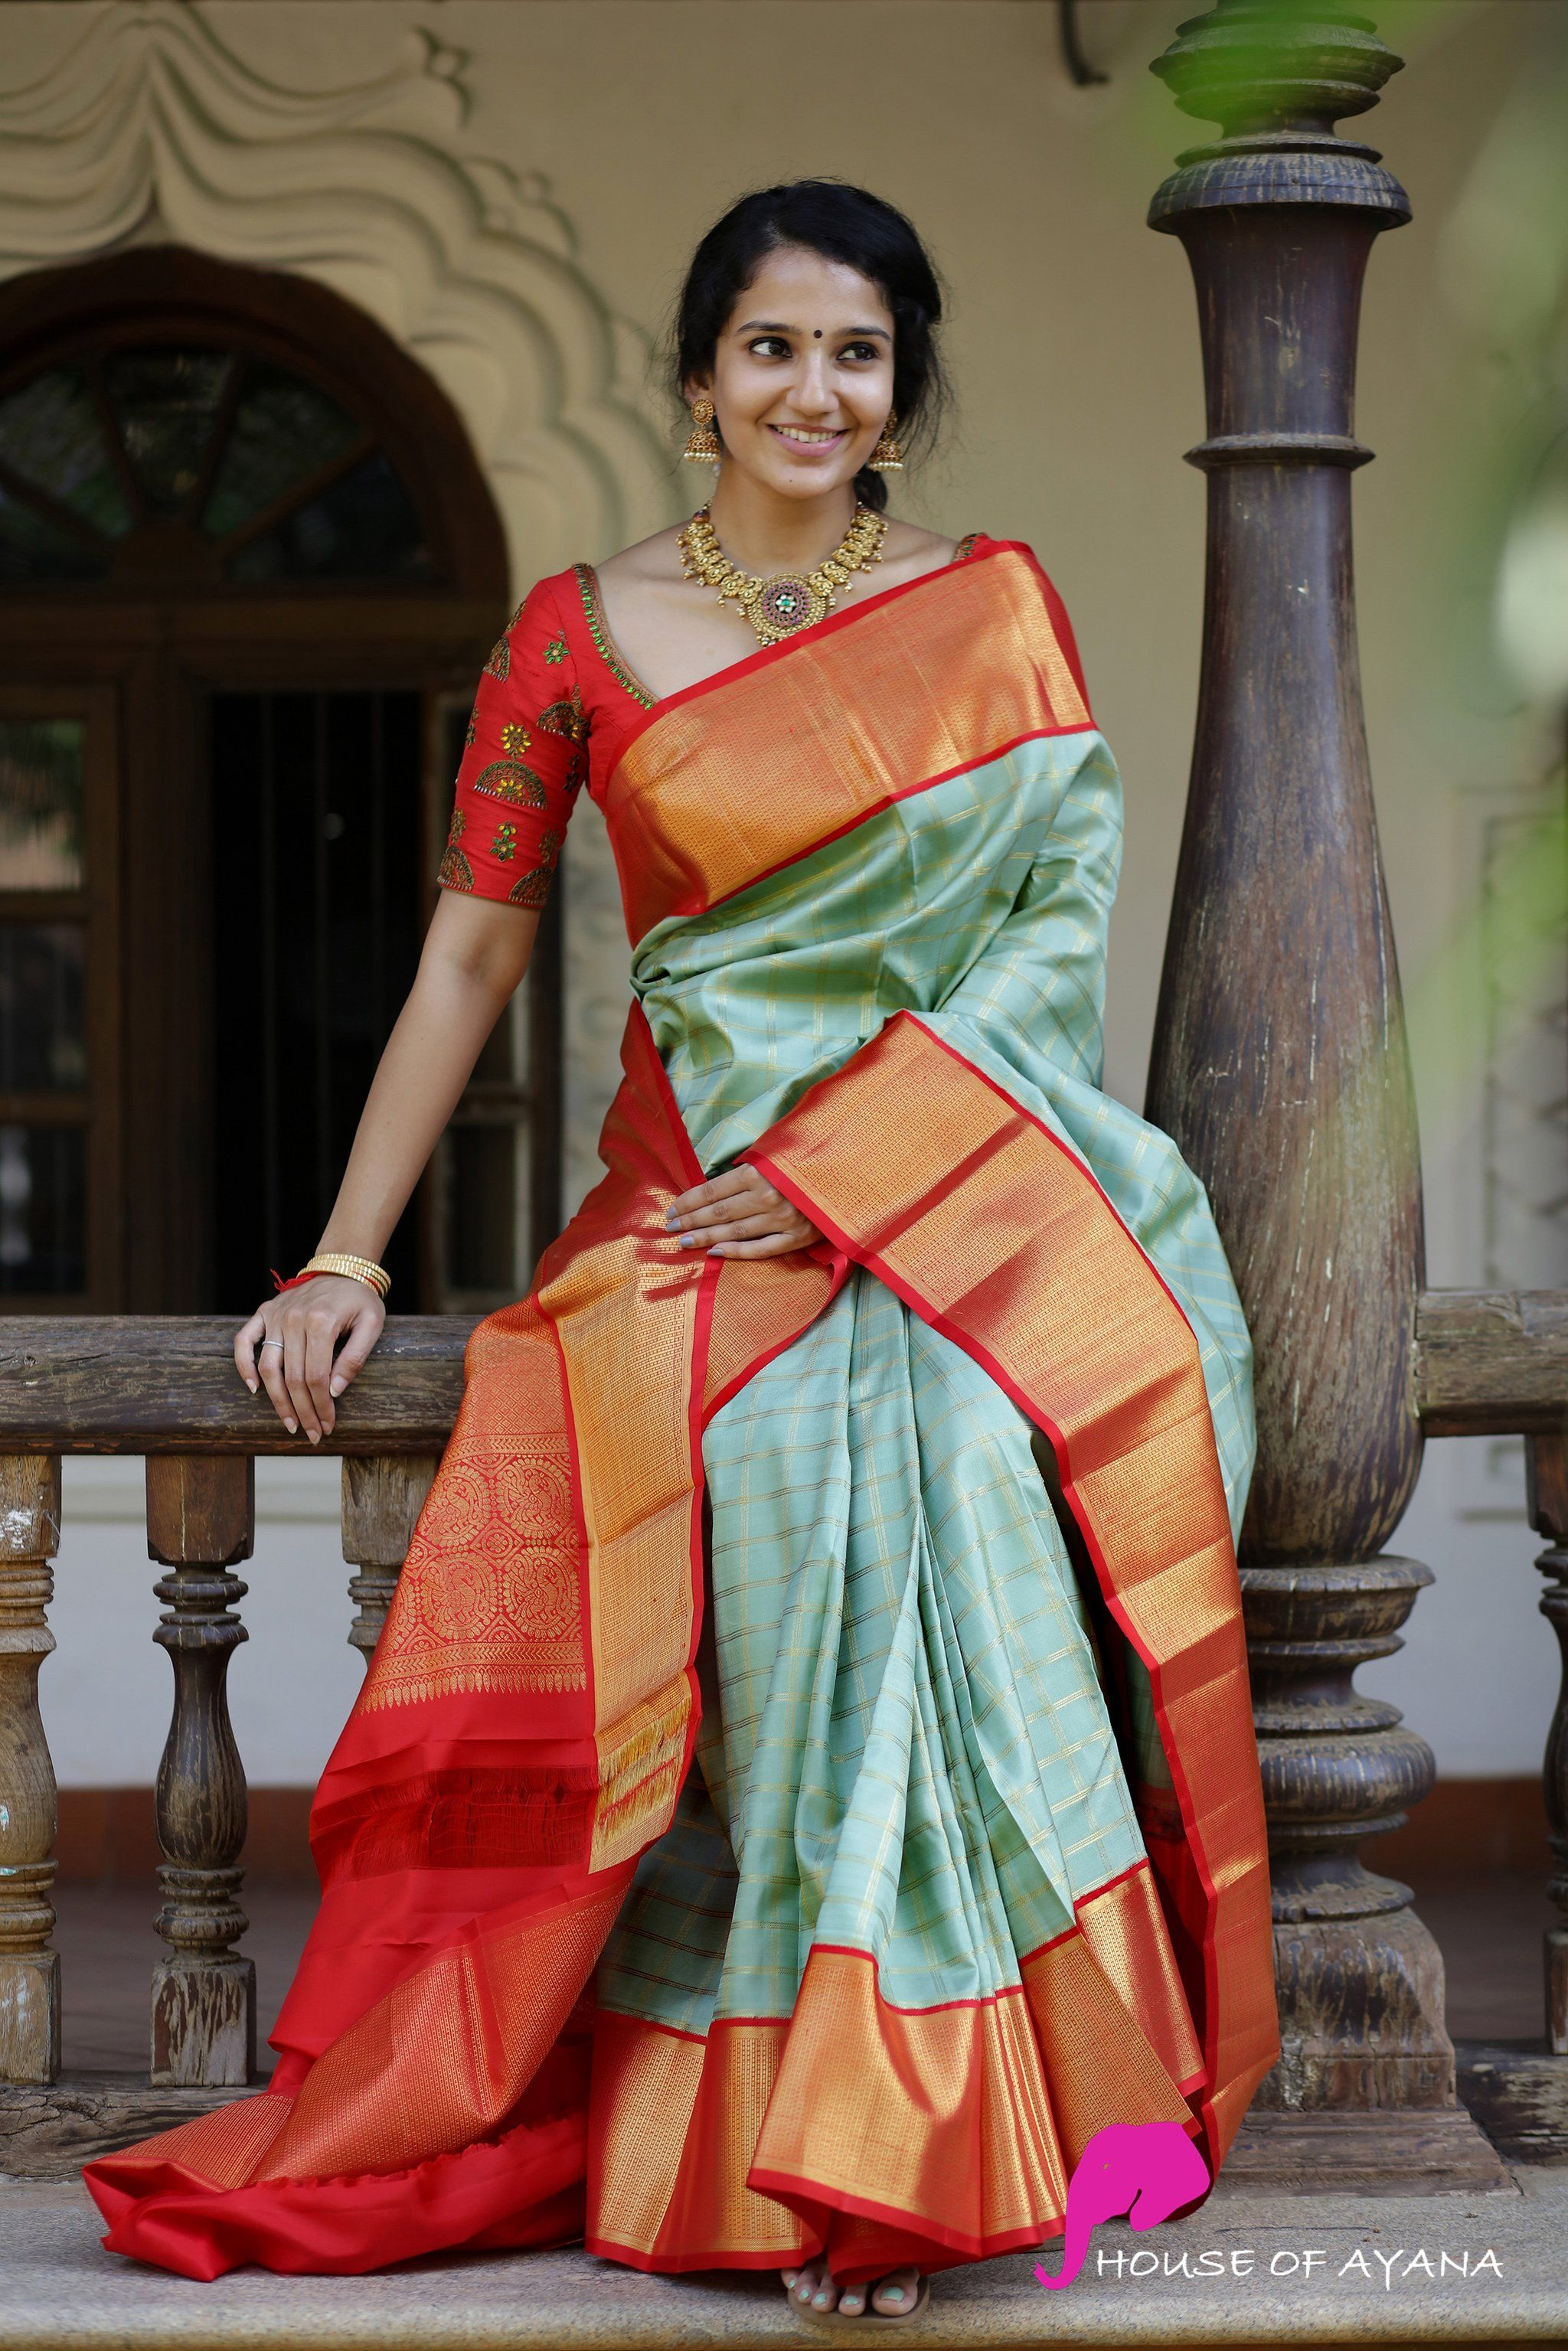 Kanchipuram Silk Sarees Shop In Chennai Bridal Kanchipuram Sarees House Of Ayana In 2020 Silk Saree Blouse Designs Wedding Saree Blouse Designs Latest Silk Sarees